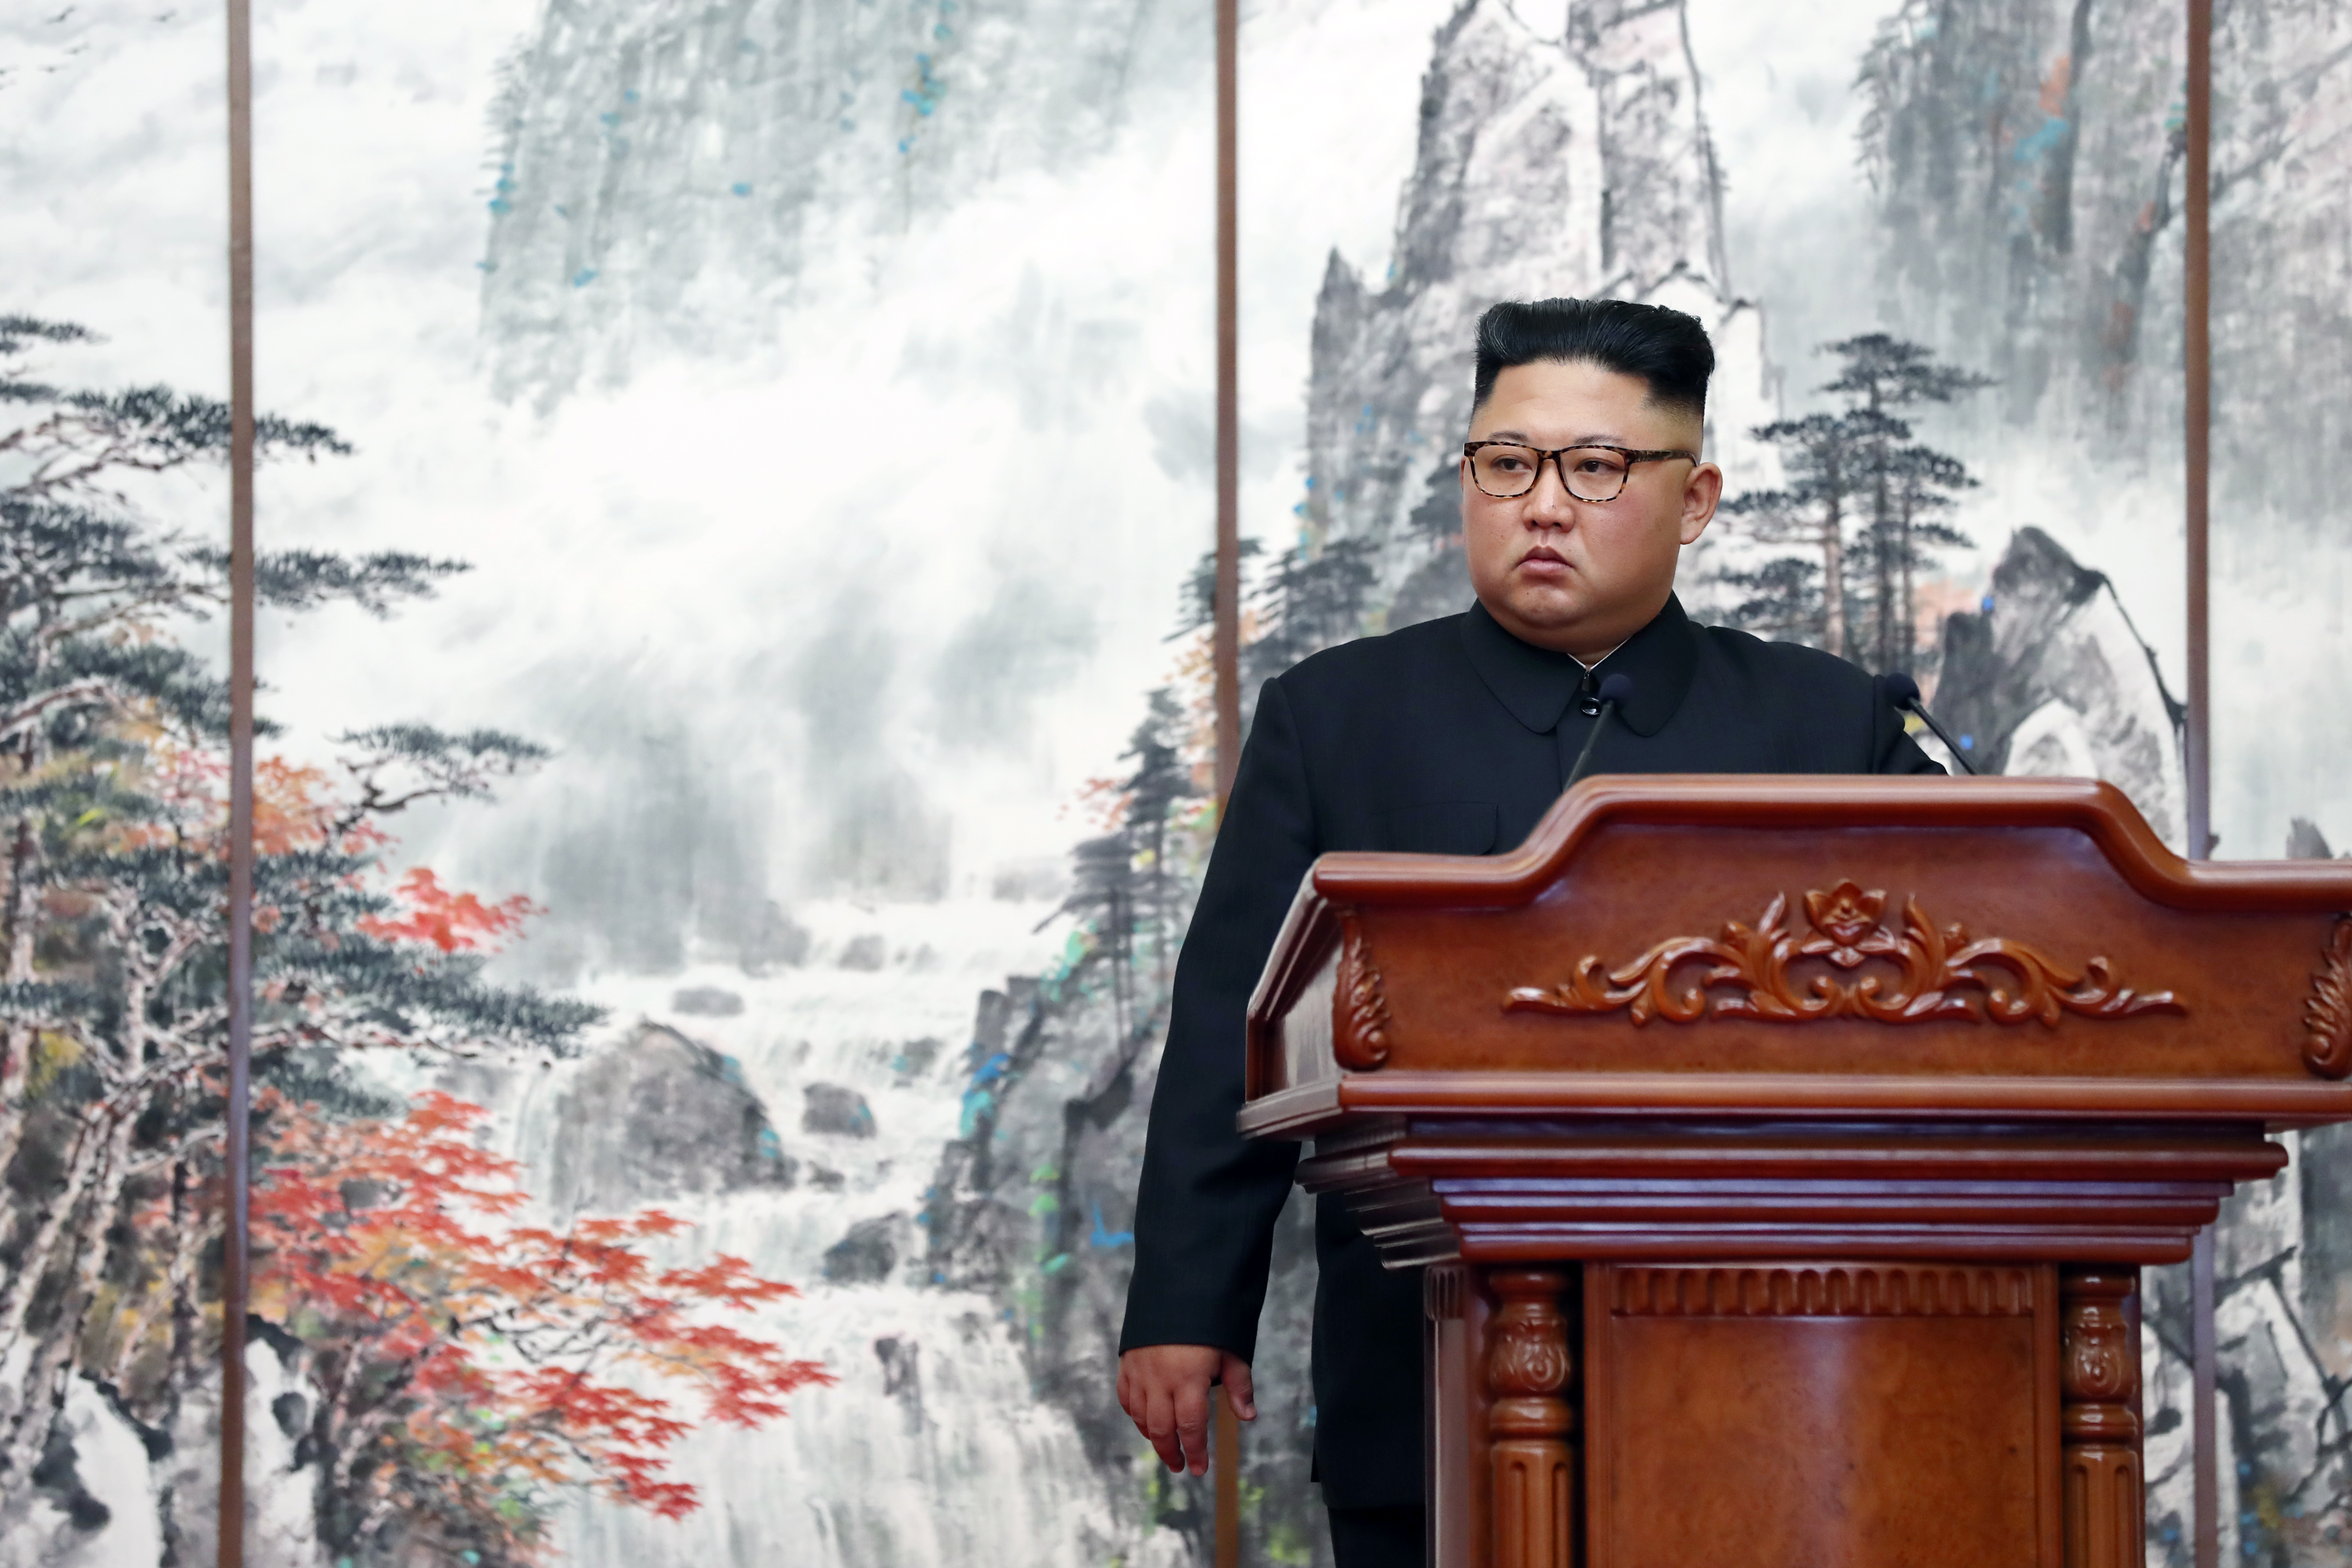 North Korean leader Kim Jong Un on September 19, 2018 in Pyongyang, North Korea.